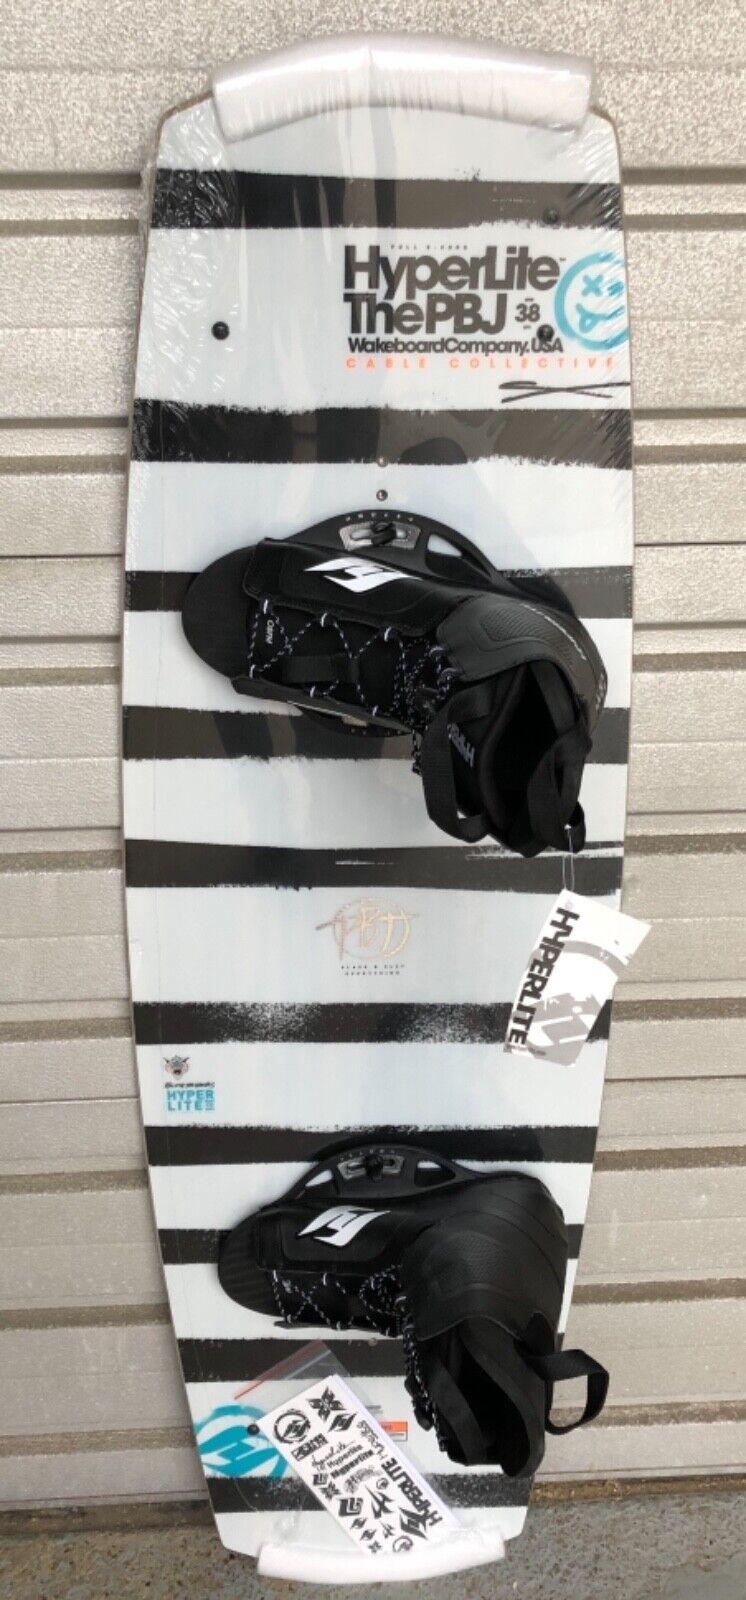 Neu Super Wakeboard Hyperlite PBJ 133 Wood Grind Base SET mit TOP Bindung 4 Fins